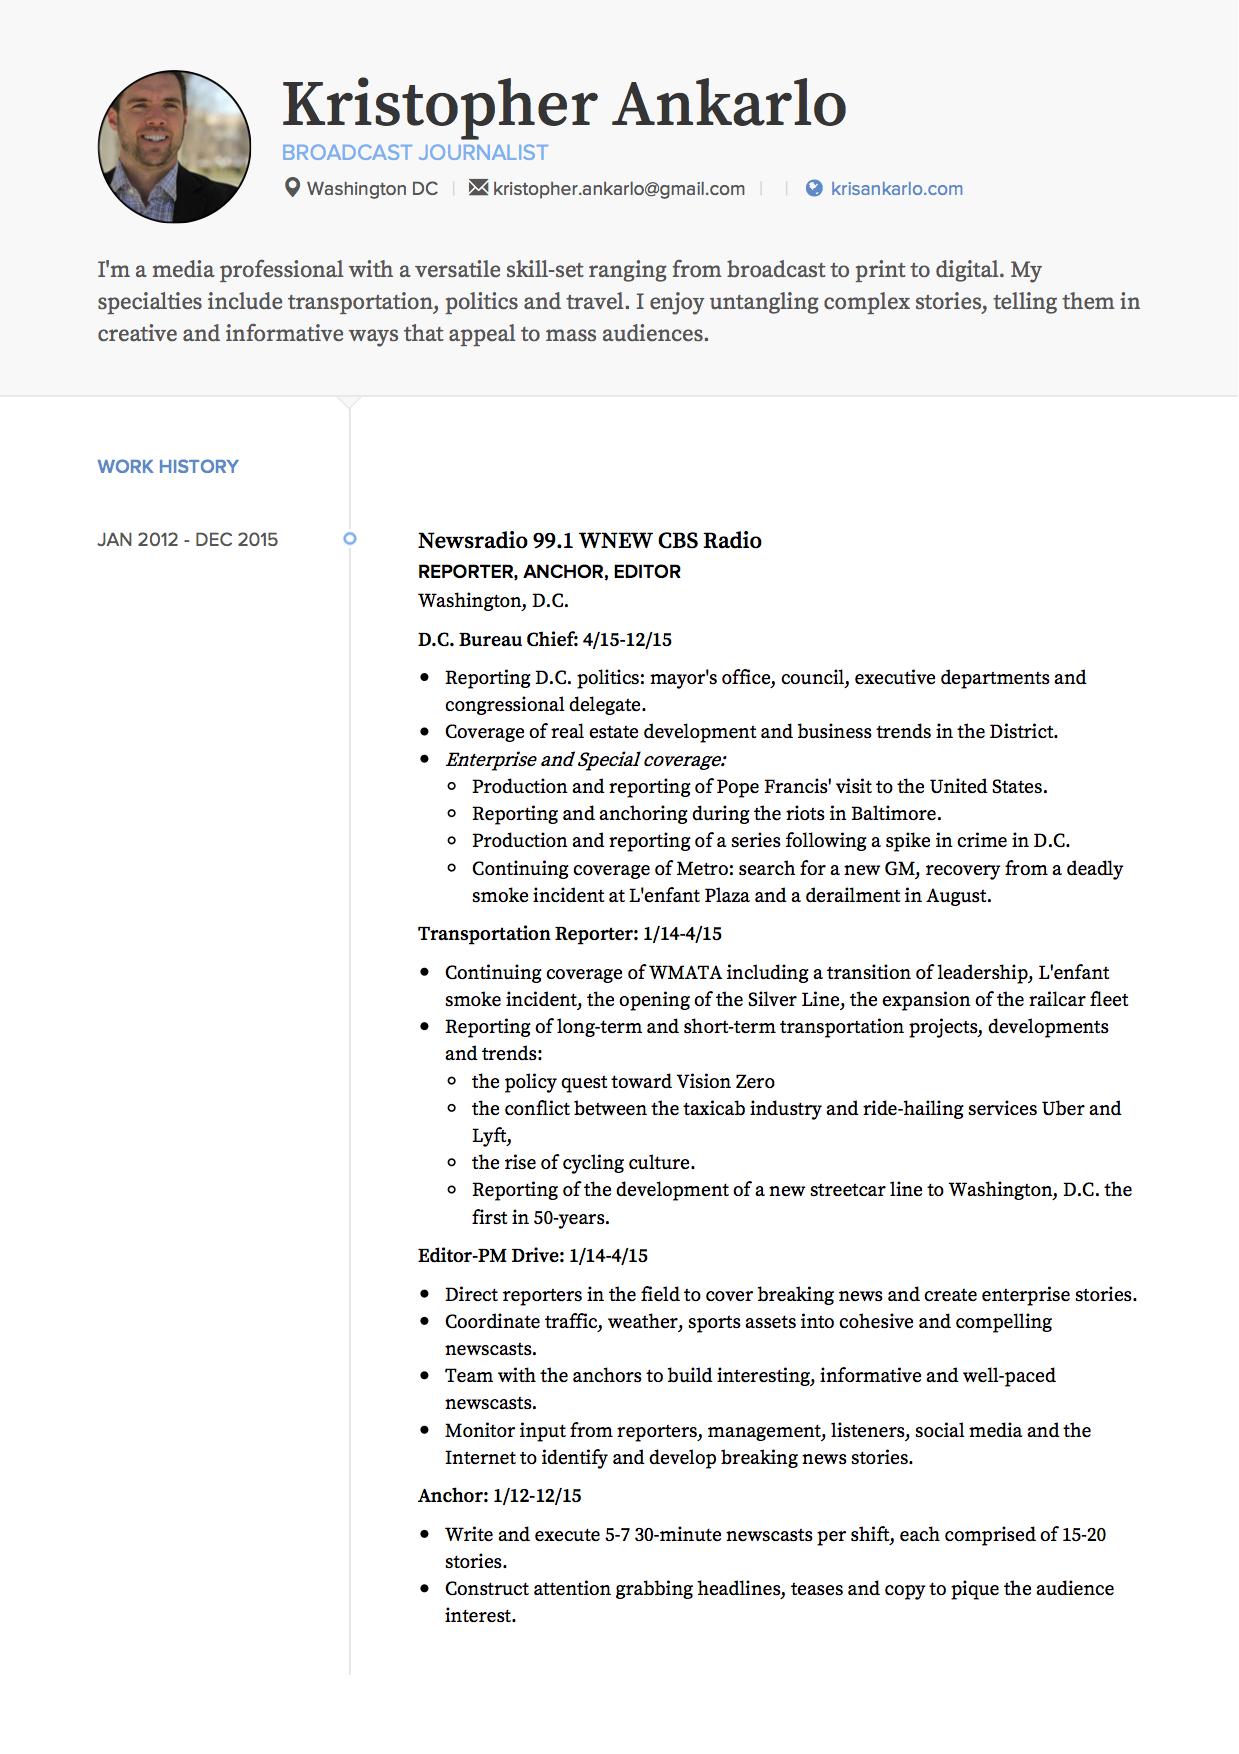 Kris Ankarlo Resume 2016 Jpg ...  How To Construct A Resume